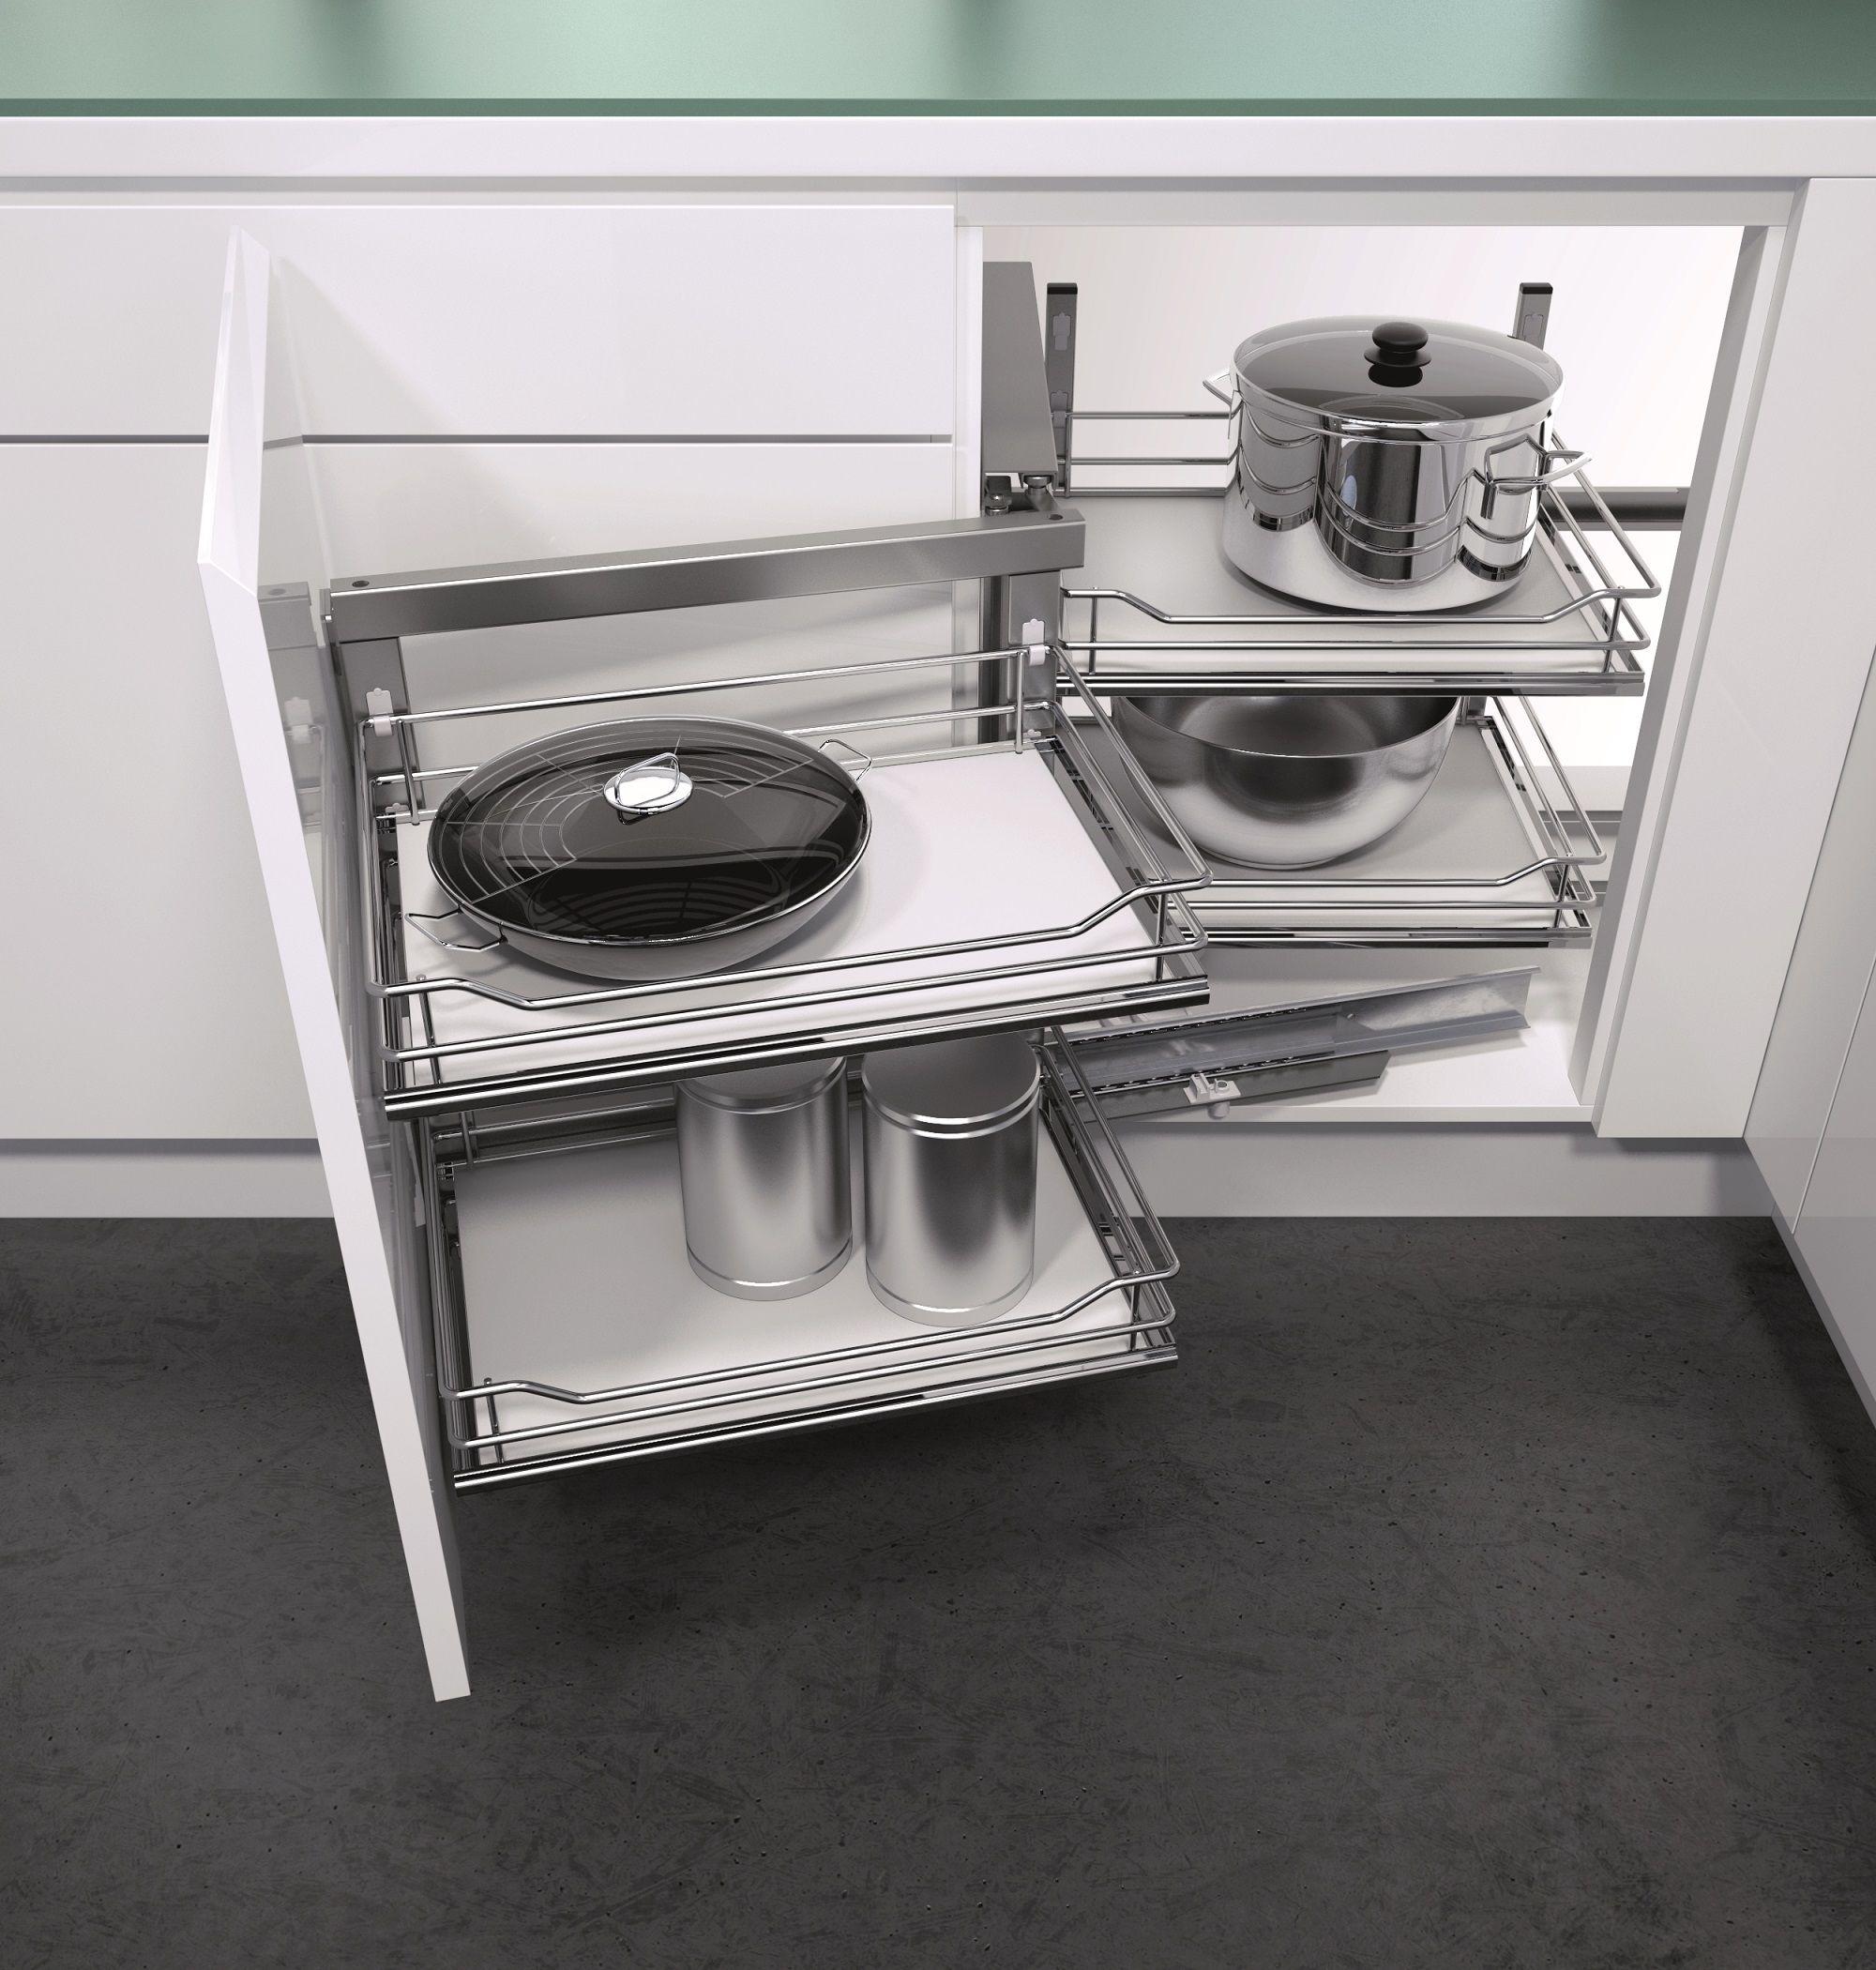 vauth sagel s wari corner unit with premea solid base shelf option